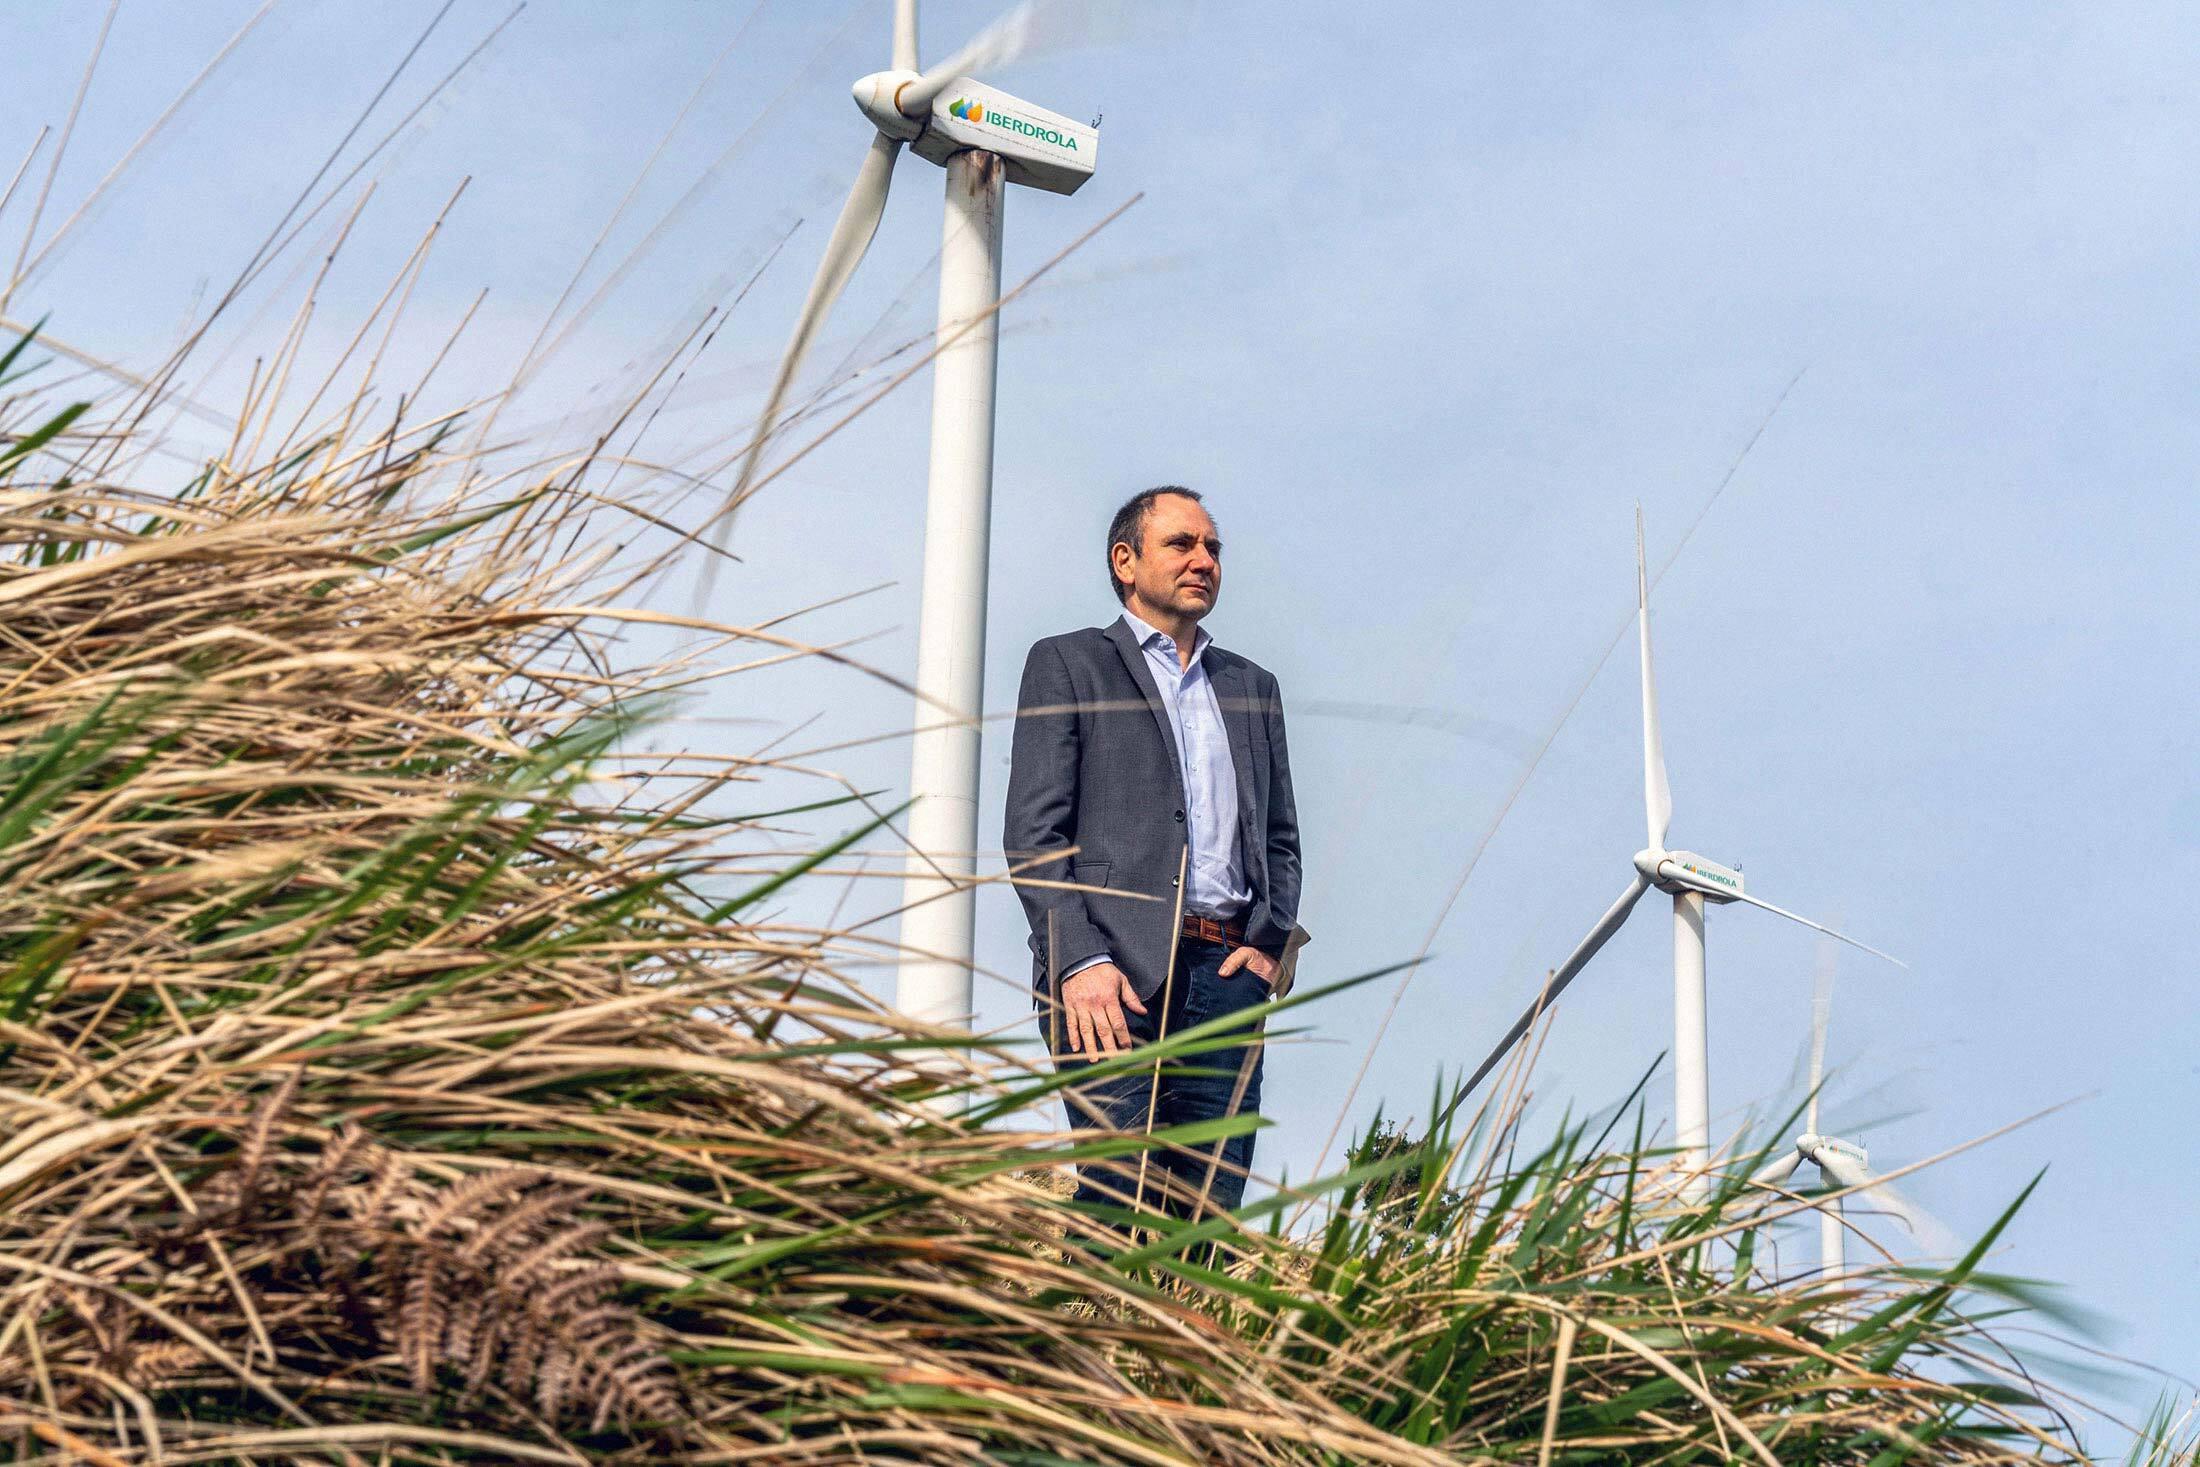 Gabriel Bermejo at a wind farm near Bilbao, Spain on March 20, 2020.